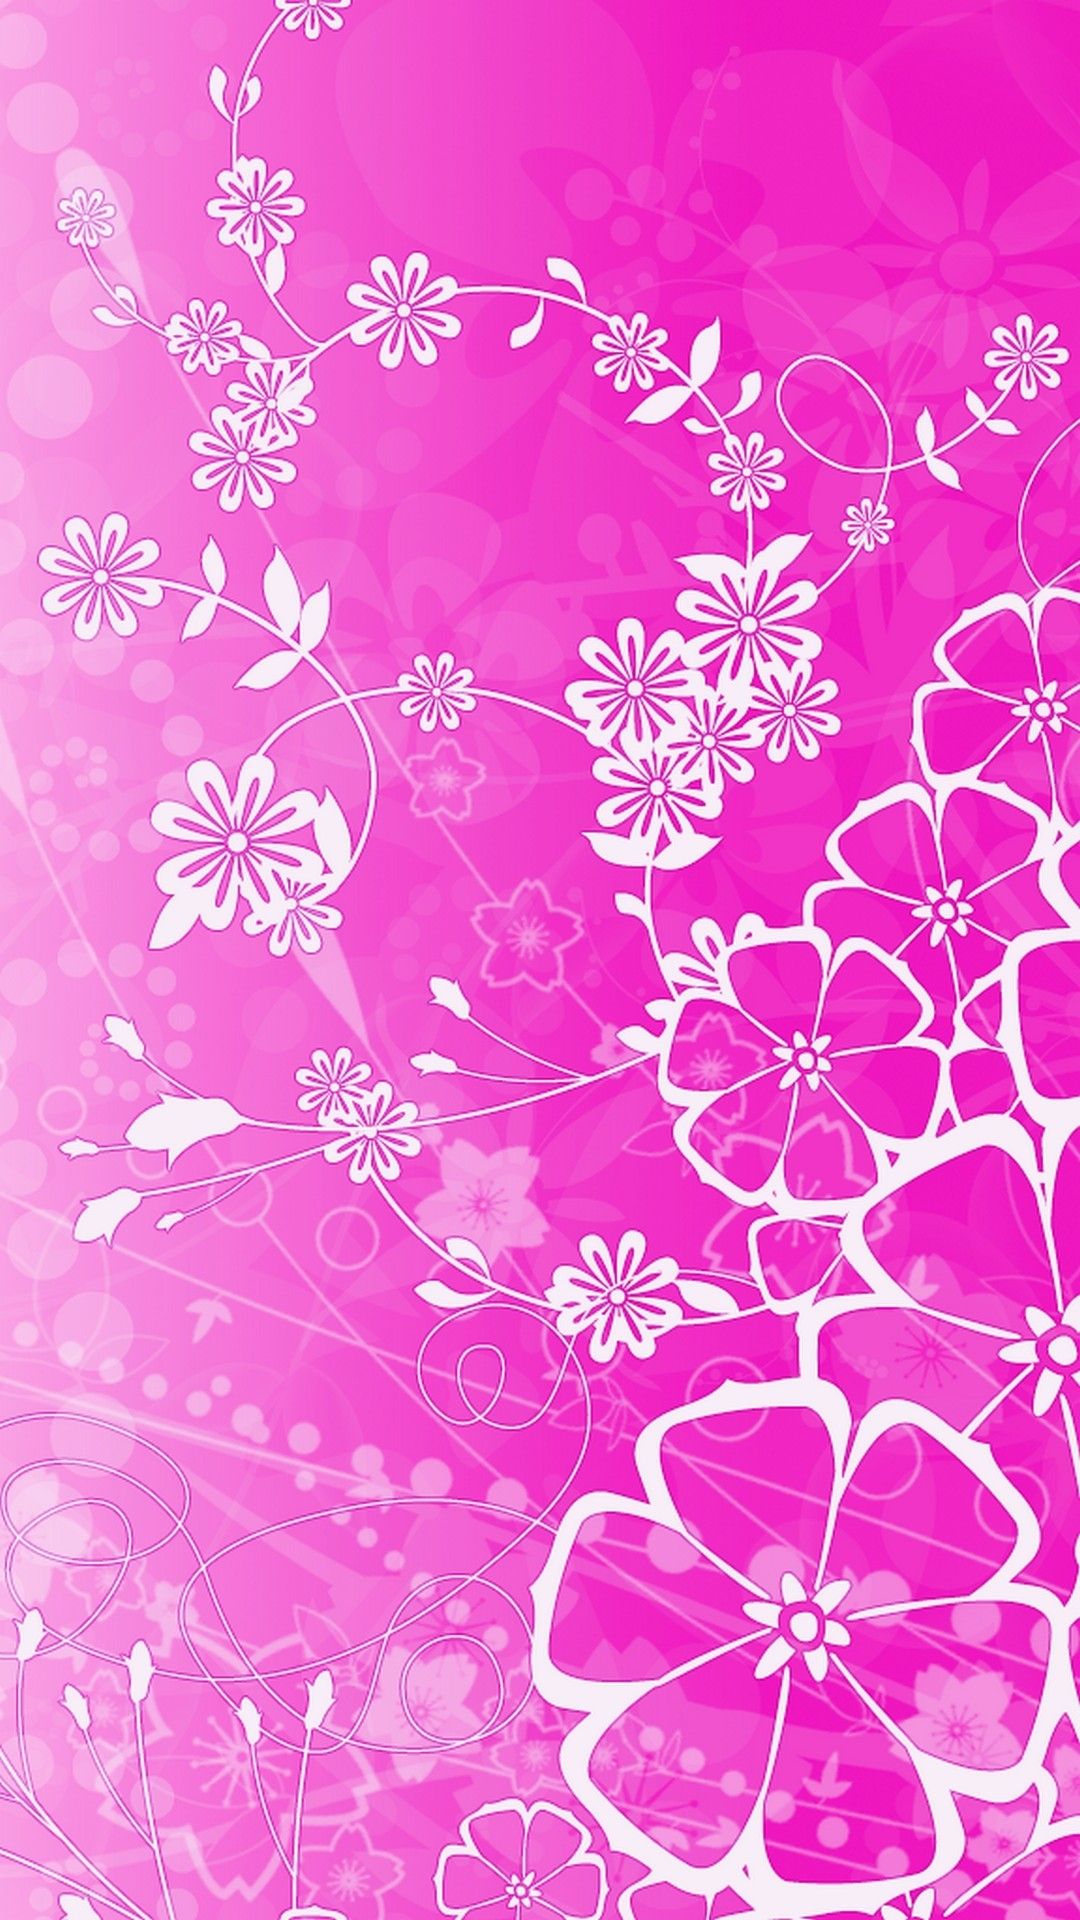 Flower pink background 1080x1920 iphone cute flower pink background resolution 1080x1920 download pretty mightylinksfo Gallery